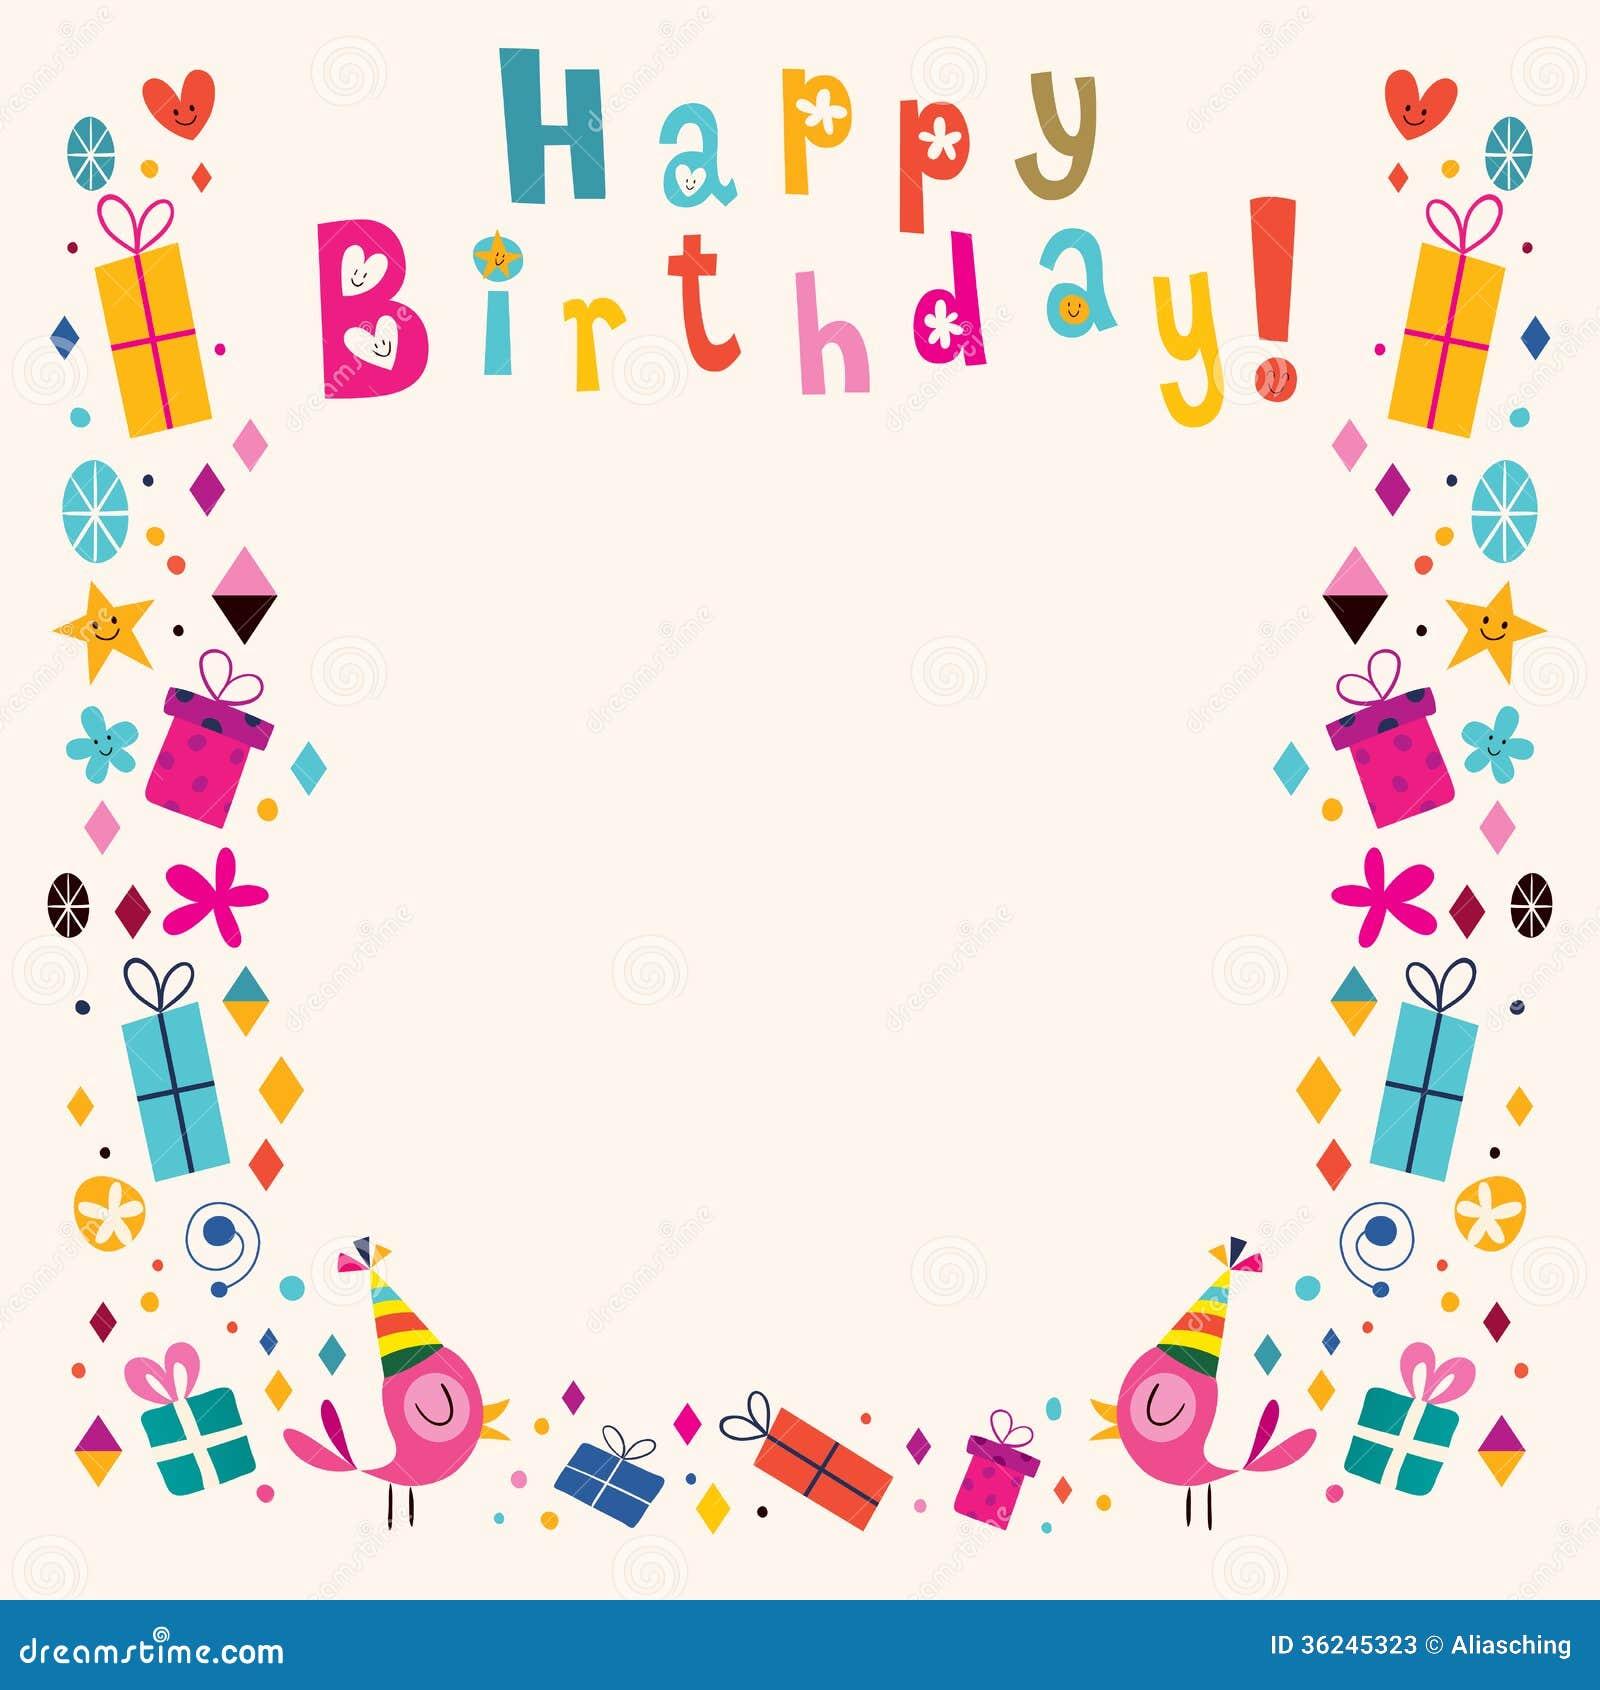 Happy Birthday Border Retro Card Stock Vector - Illustration of happy, banner: 36245323